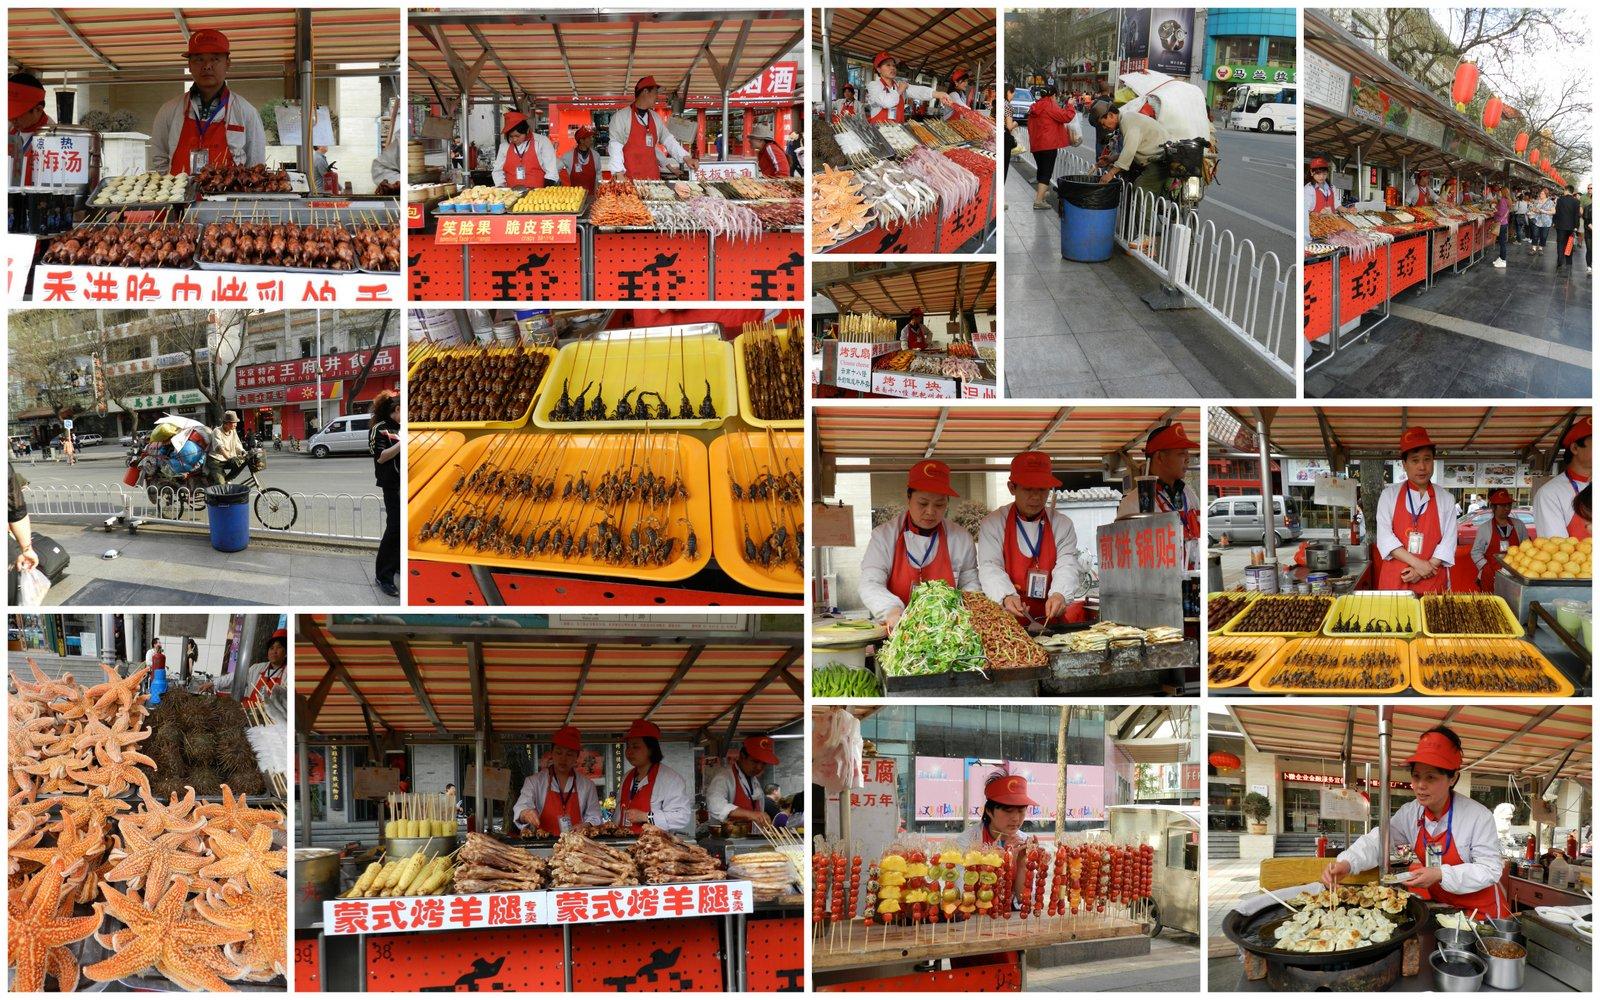 Enjoying god 39 s goodness outdoor food market for Outdoor food market